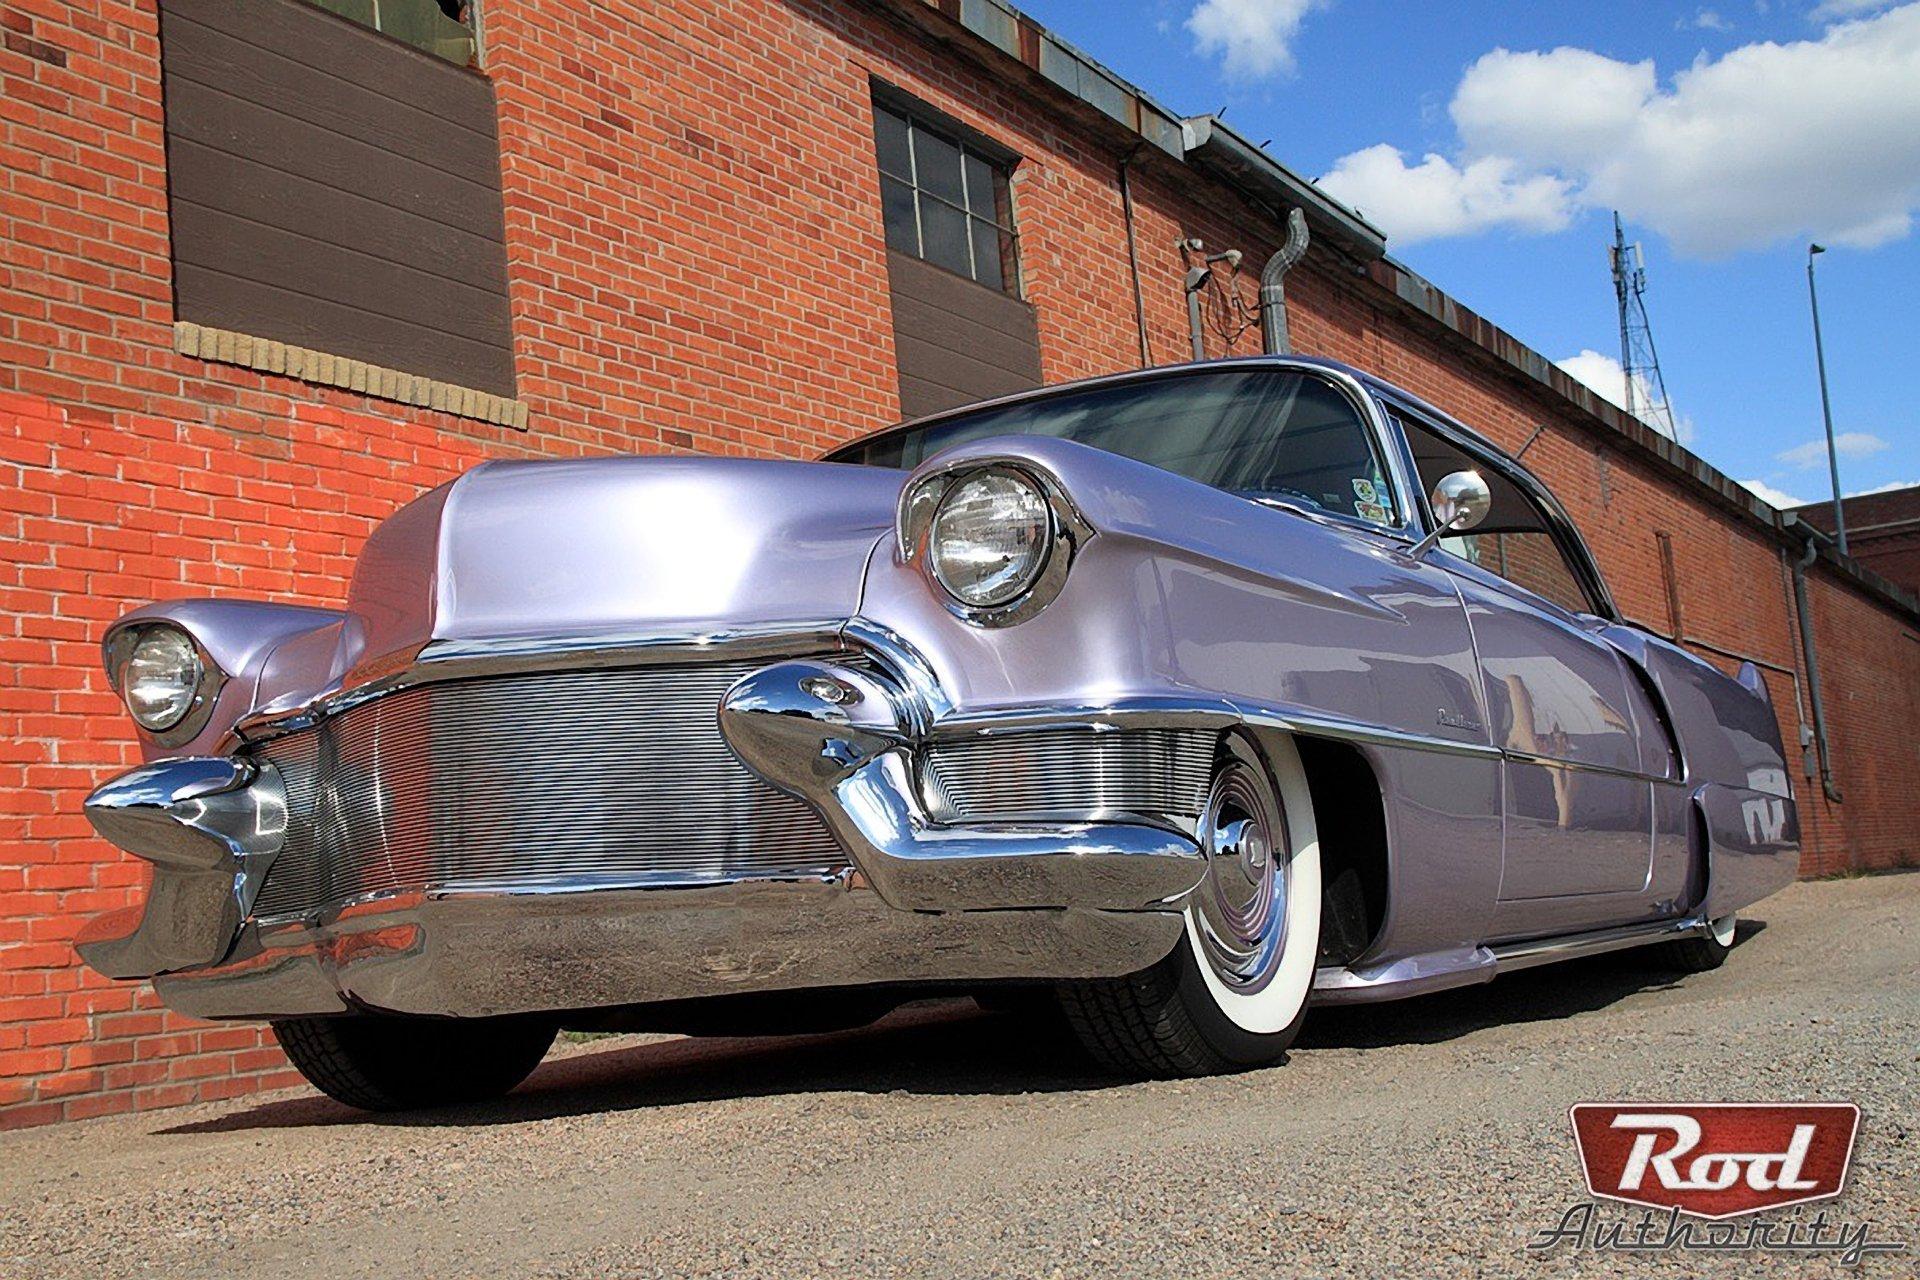 1955 Cadillac -Coupe de Ville-06 wallpaper